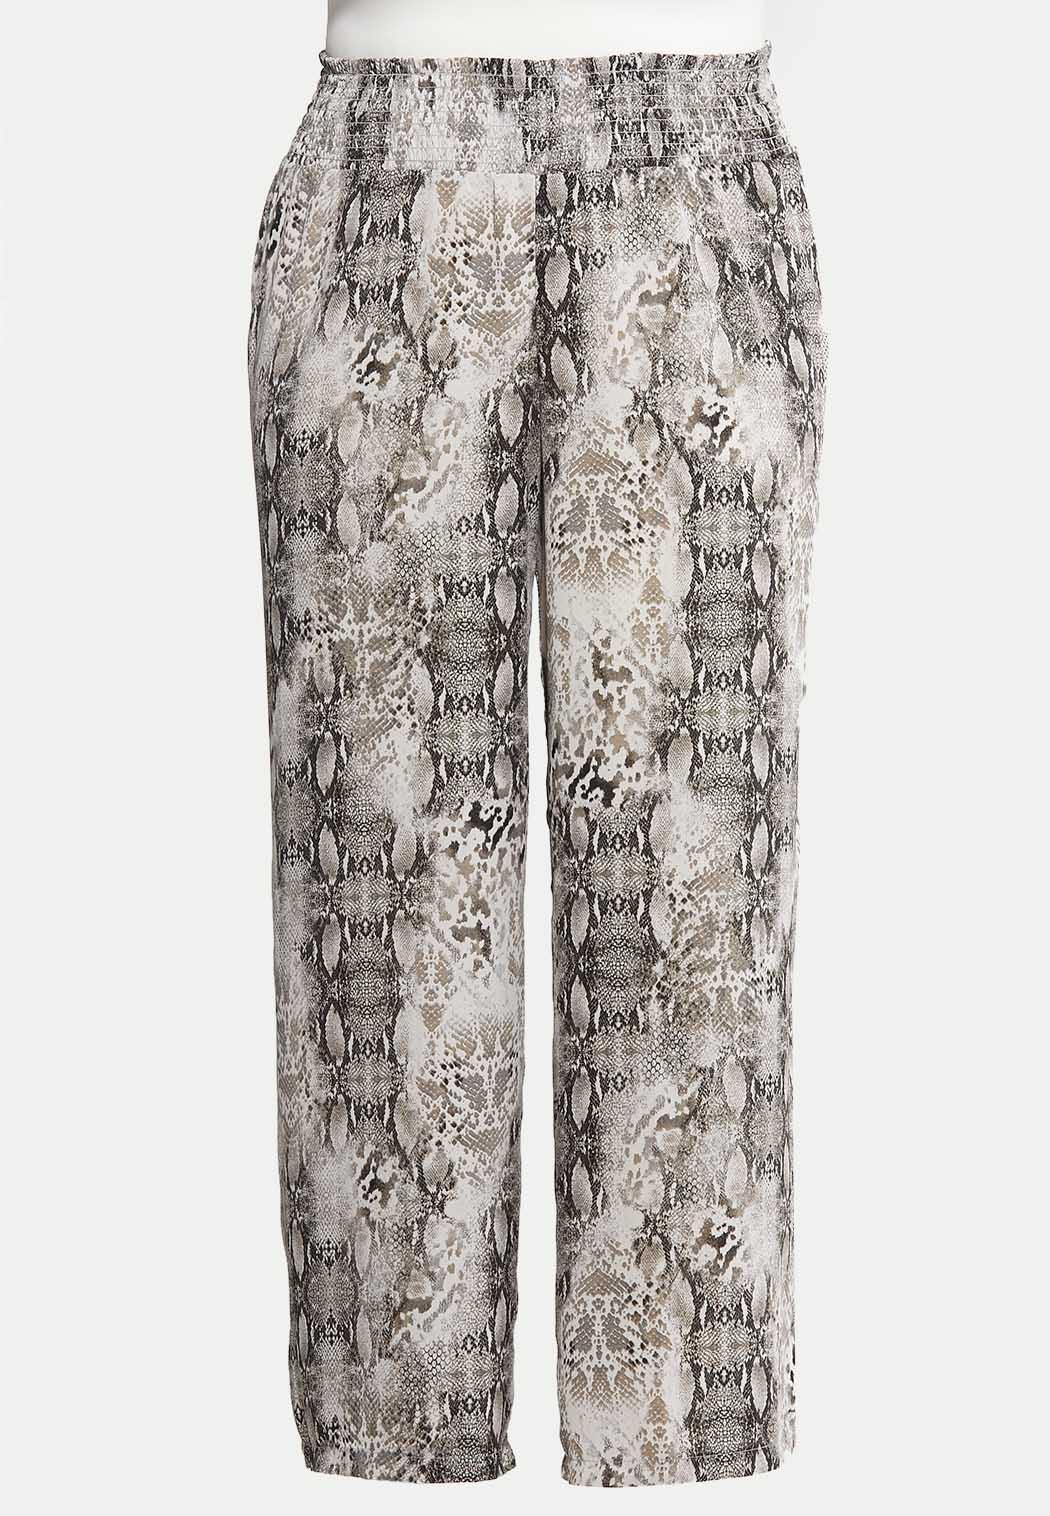 d16e30dc8445 Plus Size Snake Print Palazzo Pants Wide Leg Cato Fashions